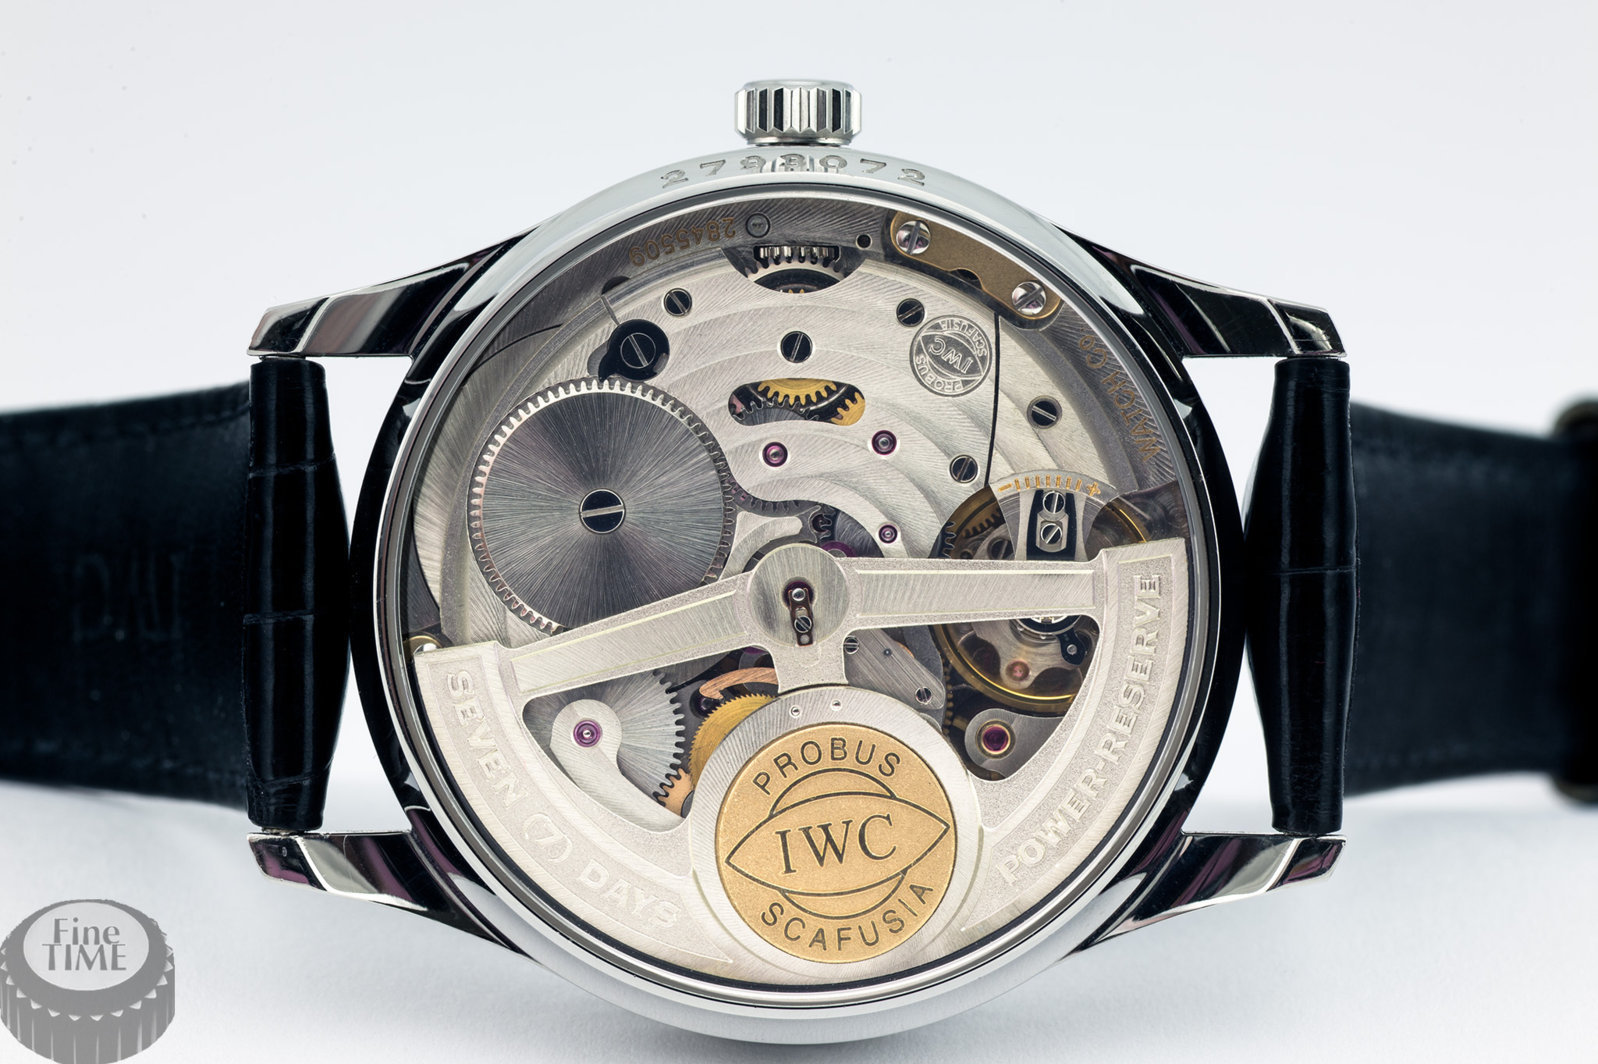 iwc-portuguese-automatic-iw5000-02.jpg